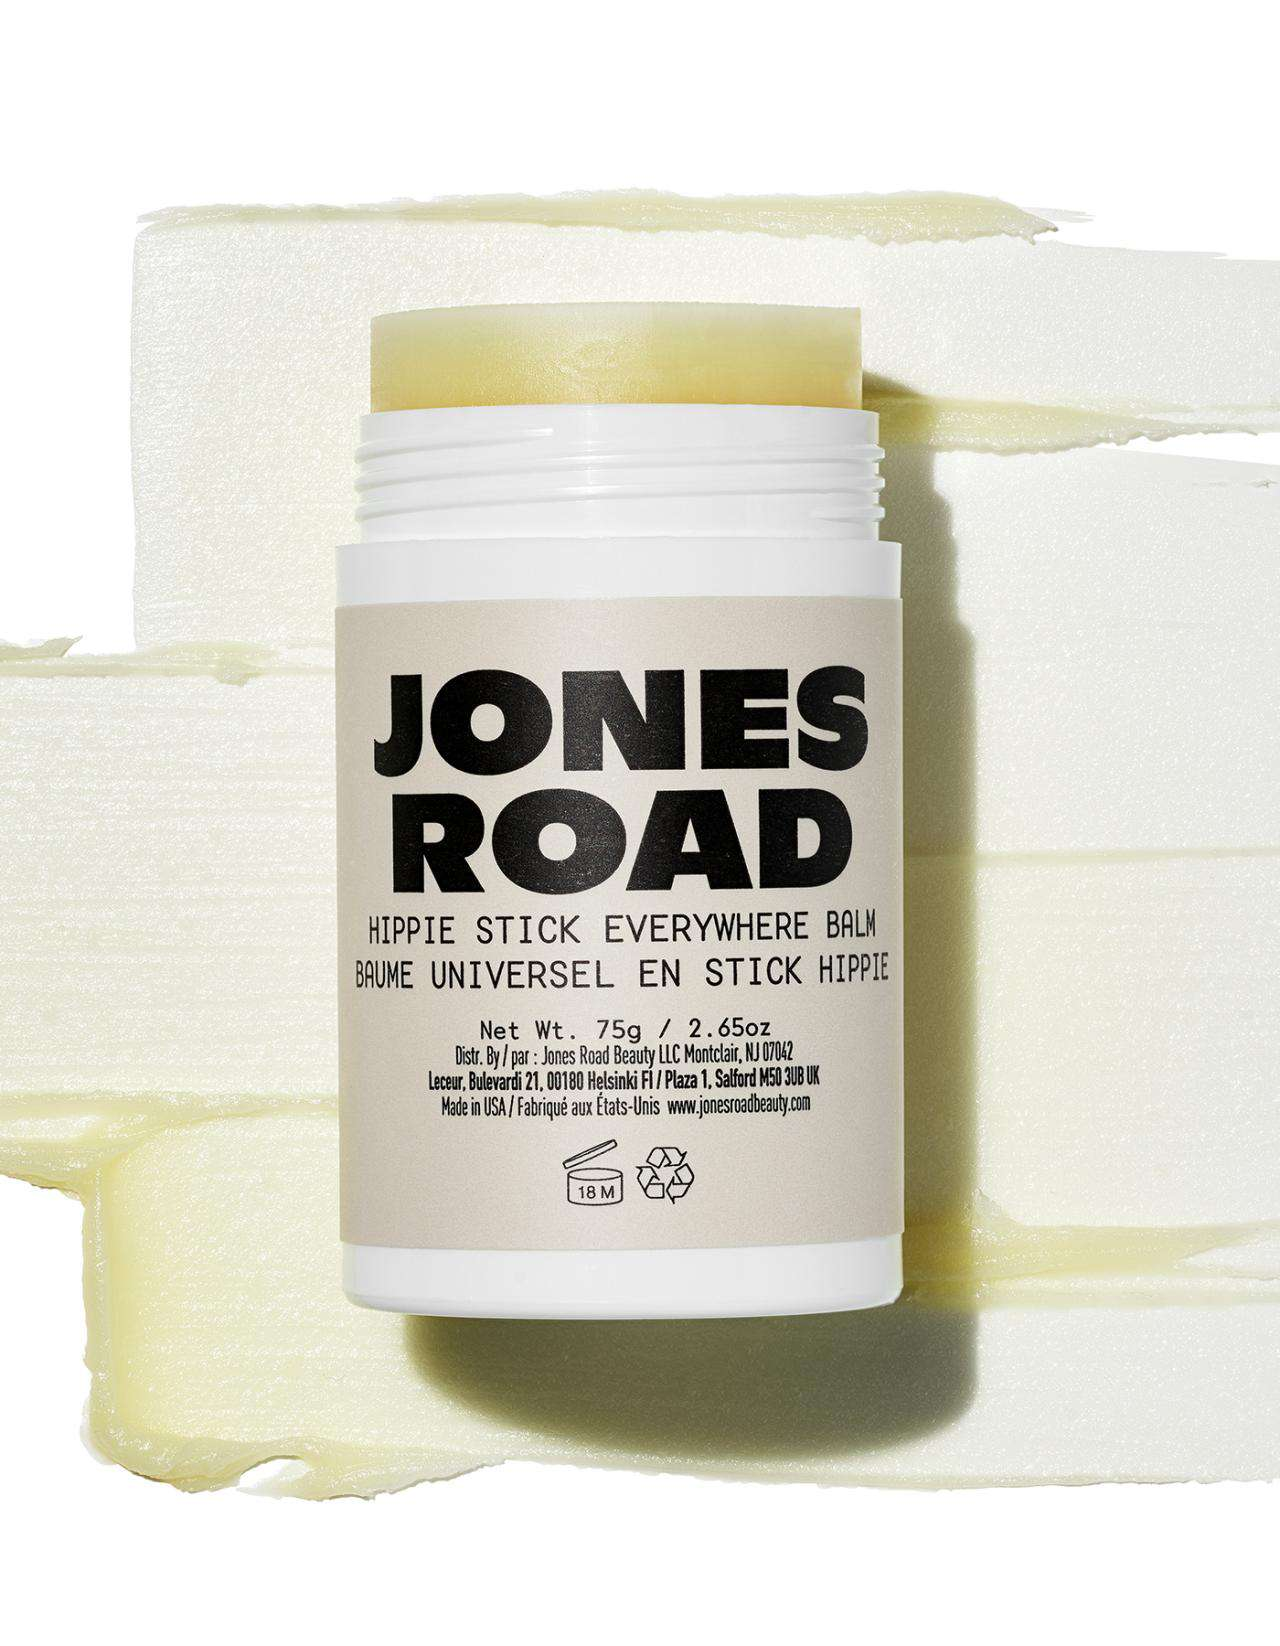 Jones Road Beauty The Hippie Stick